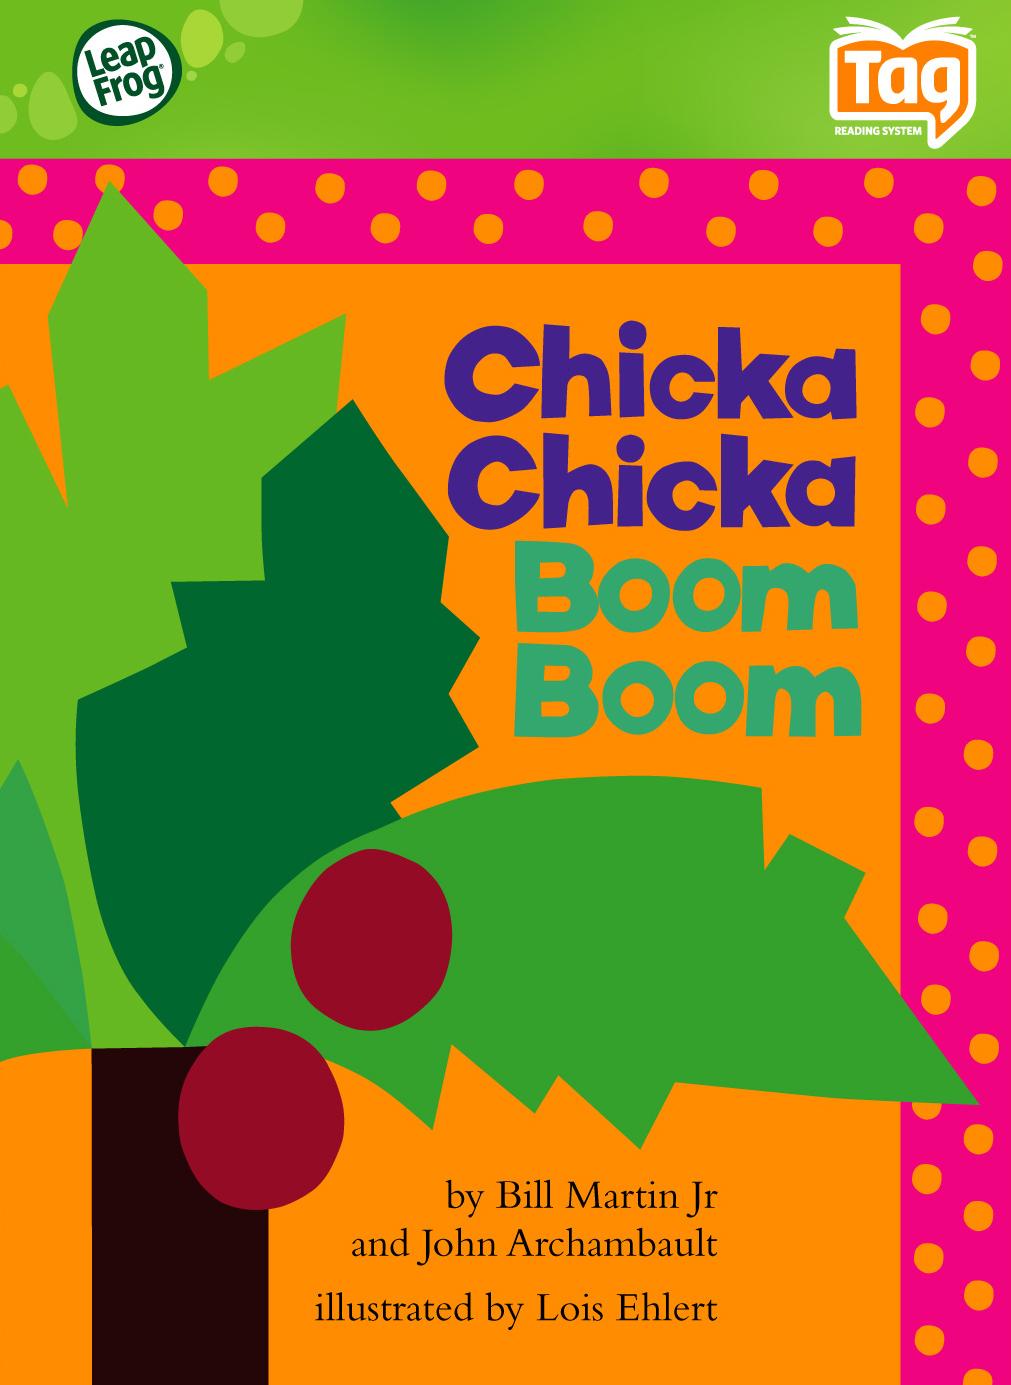 Chicka Chicka 1, 2, 3 (Chicka Chicka Book, A) by Bill Martin Jr., Michael Sampso